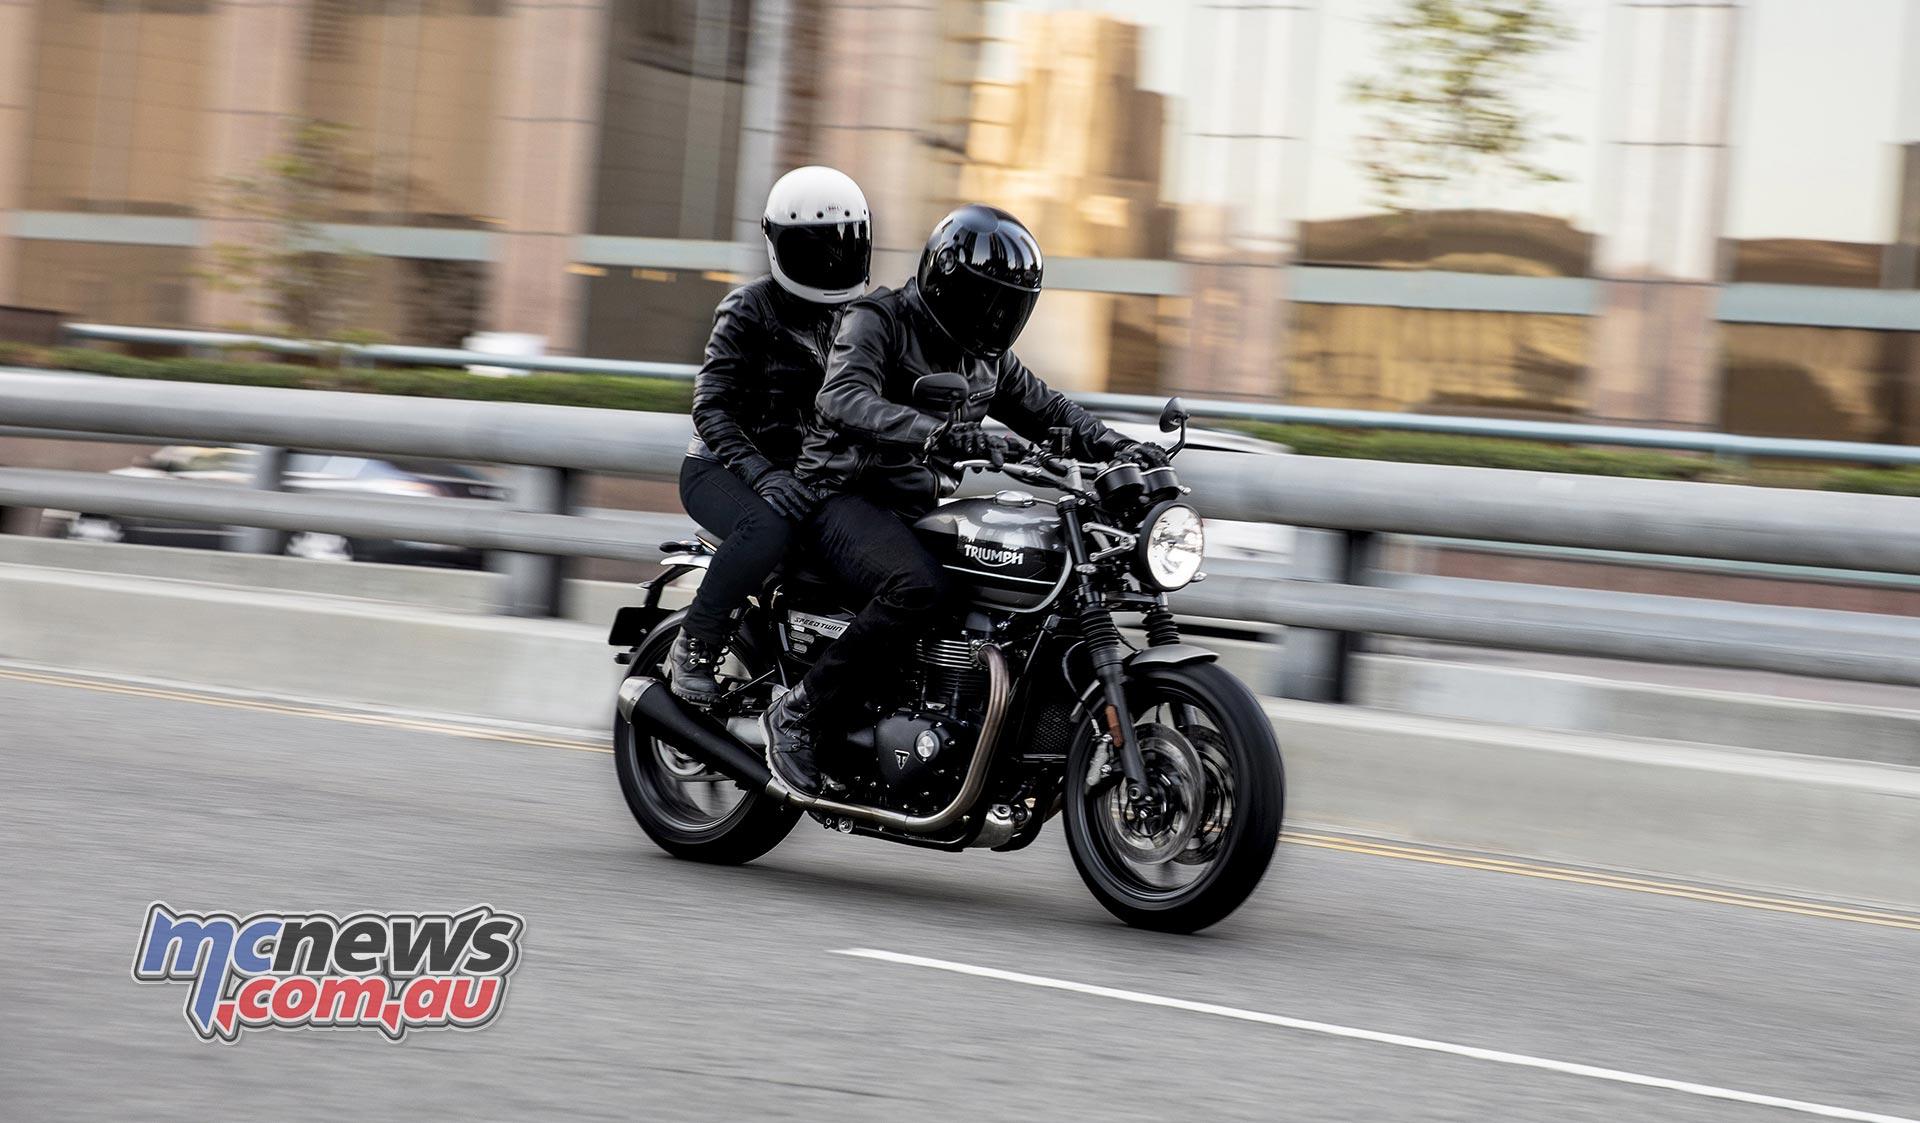 2019 Triumph Speed Twin 196kg 112 Nm 96 Hp Mcnews